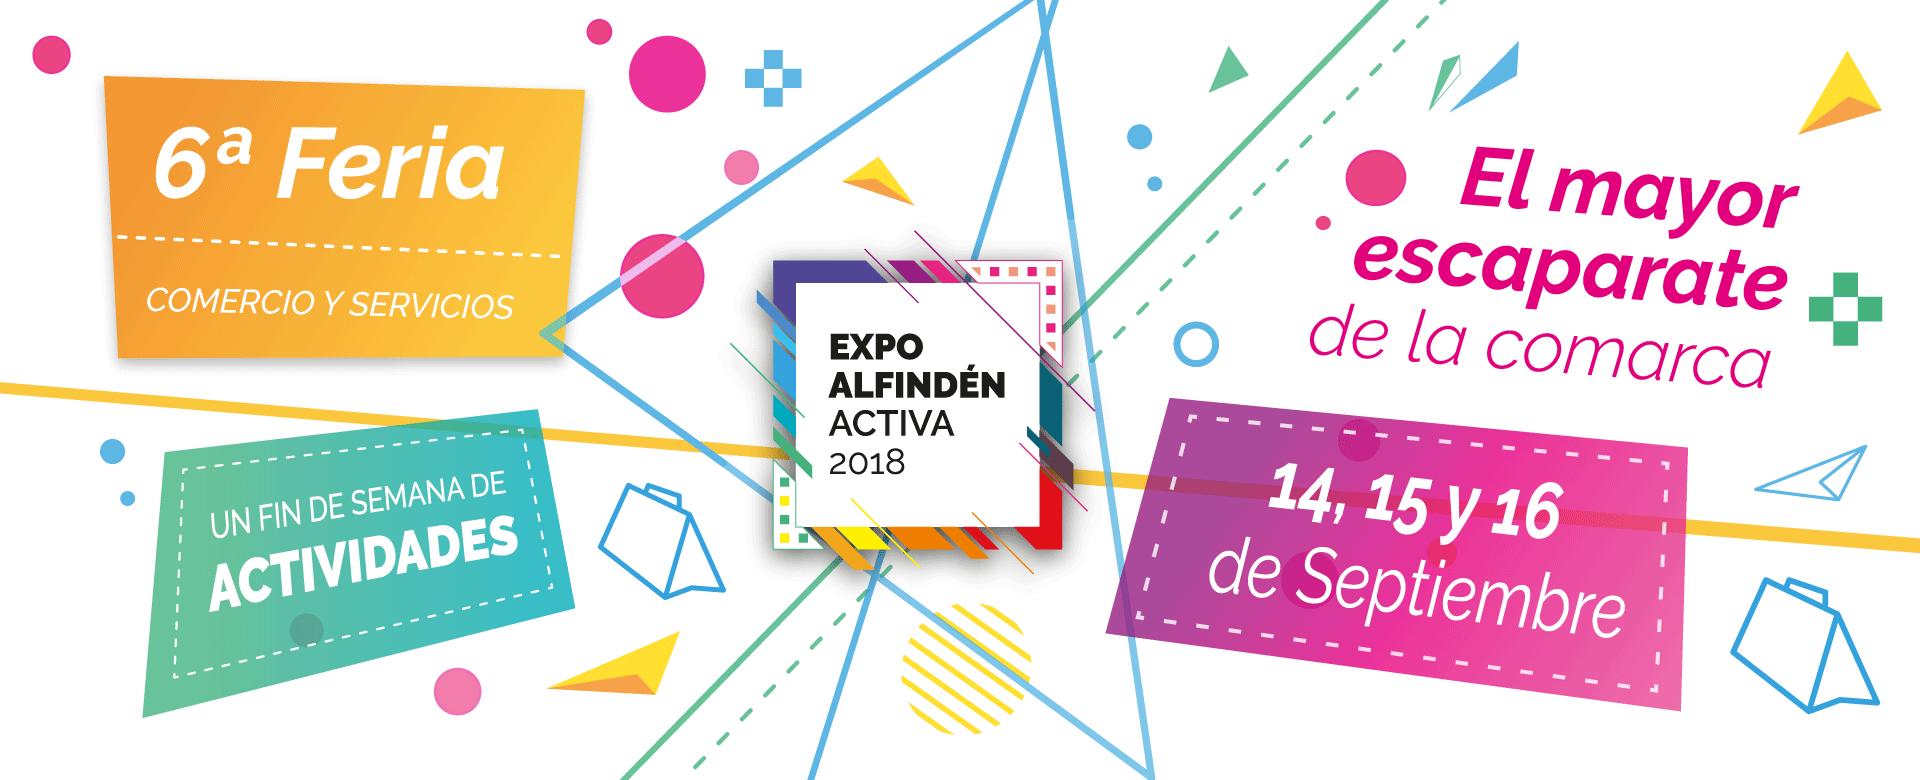 Expo Alfindén 2018